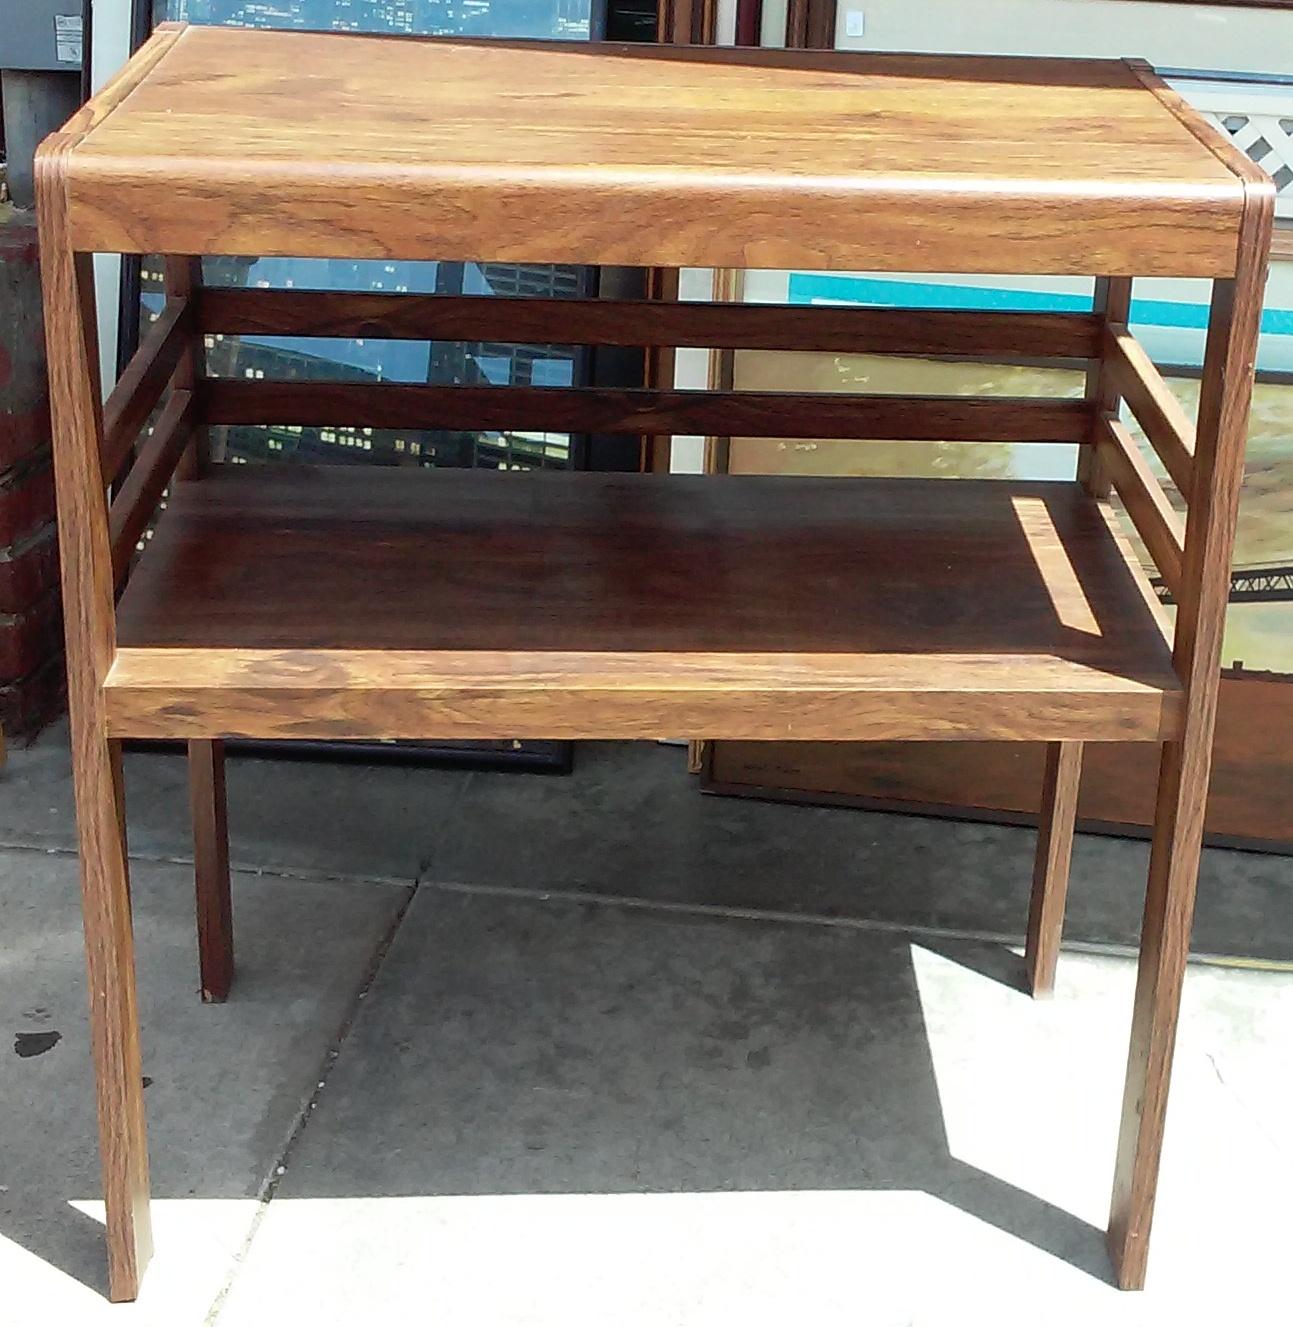 uhuru furniture amp collectibles sold 987 simple oak